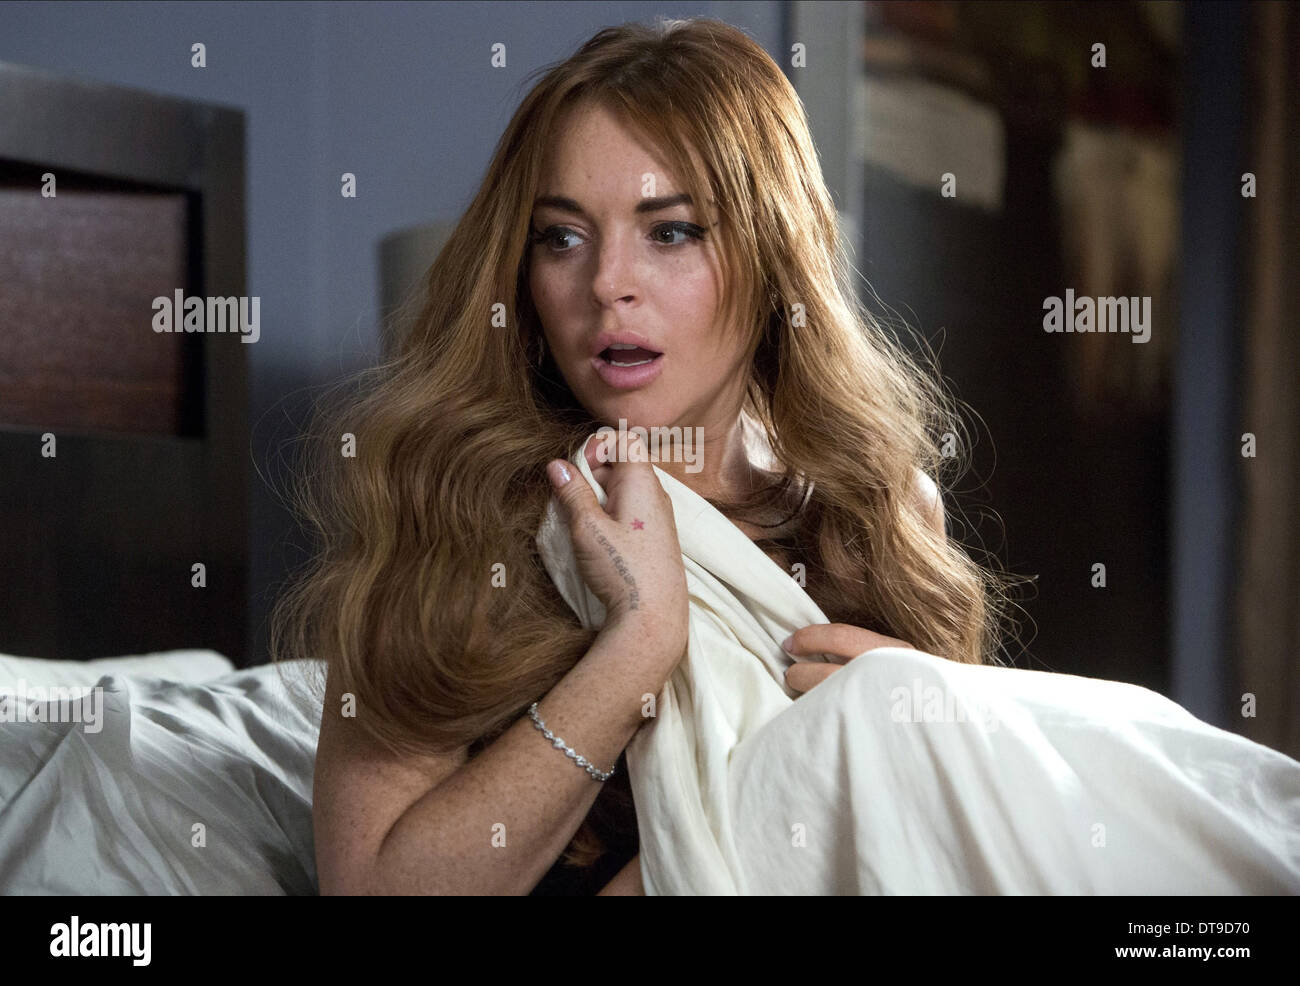 Lindsay Lohan Scary Movie 5 2013 Stock Photo Alamy